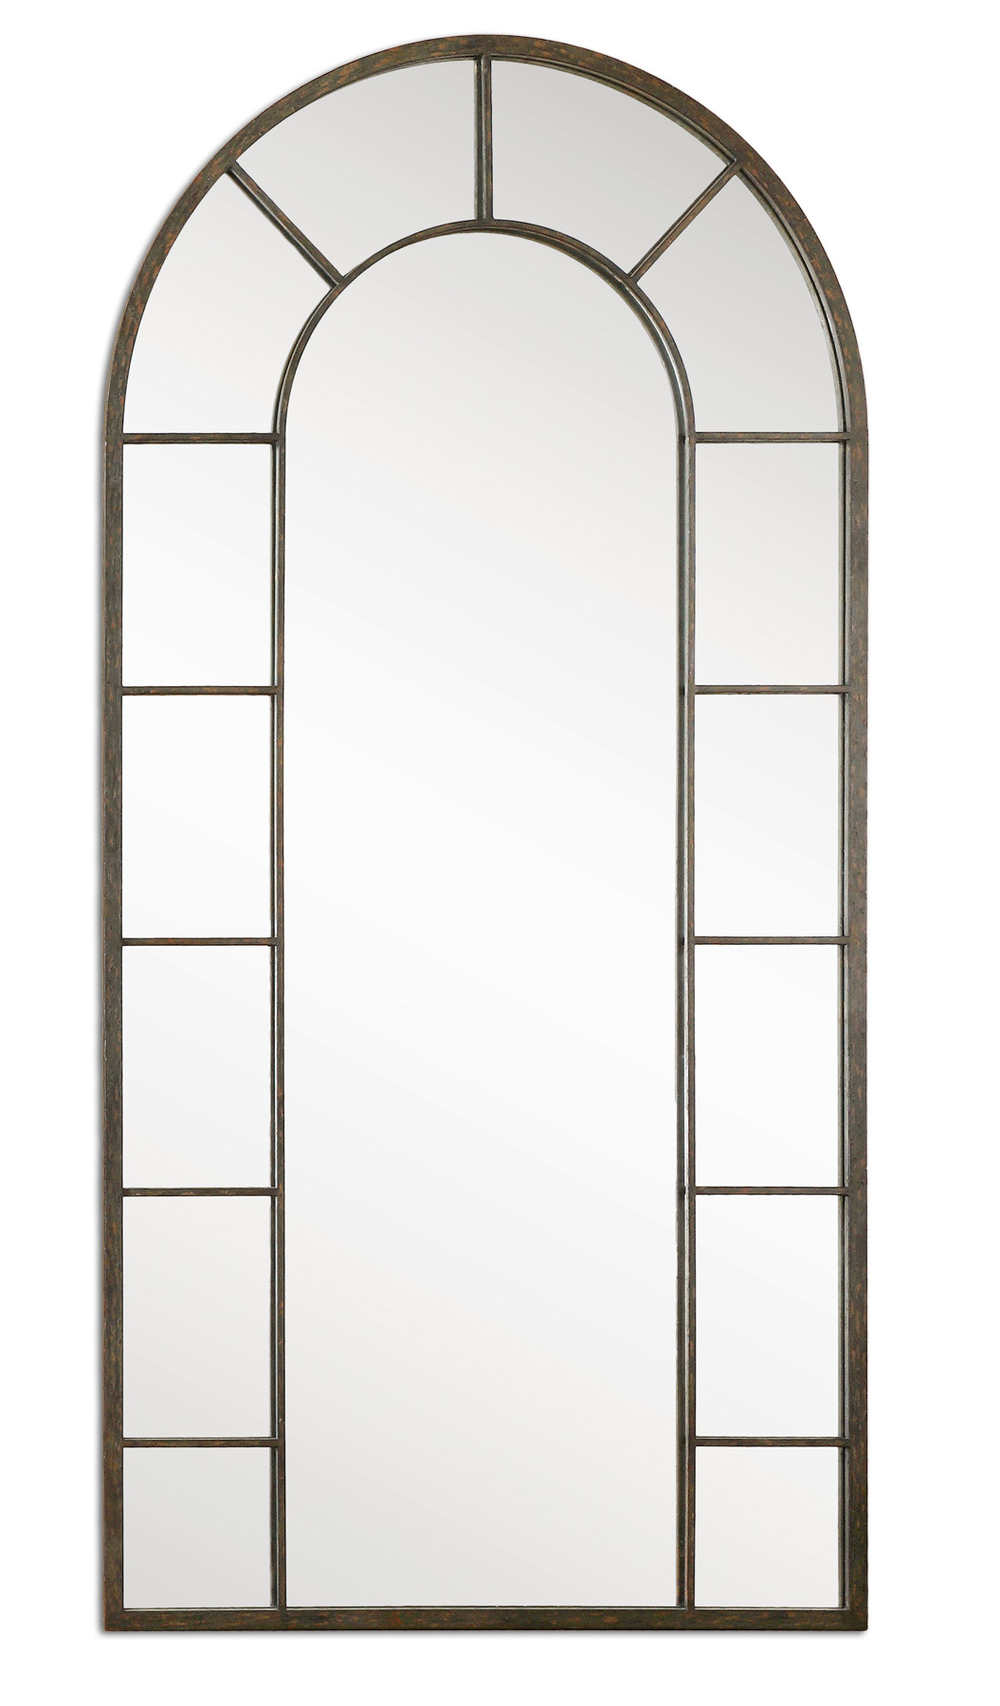 Uttermost Company - Dillingham Arch Mirror